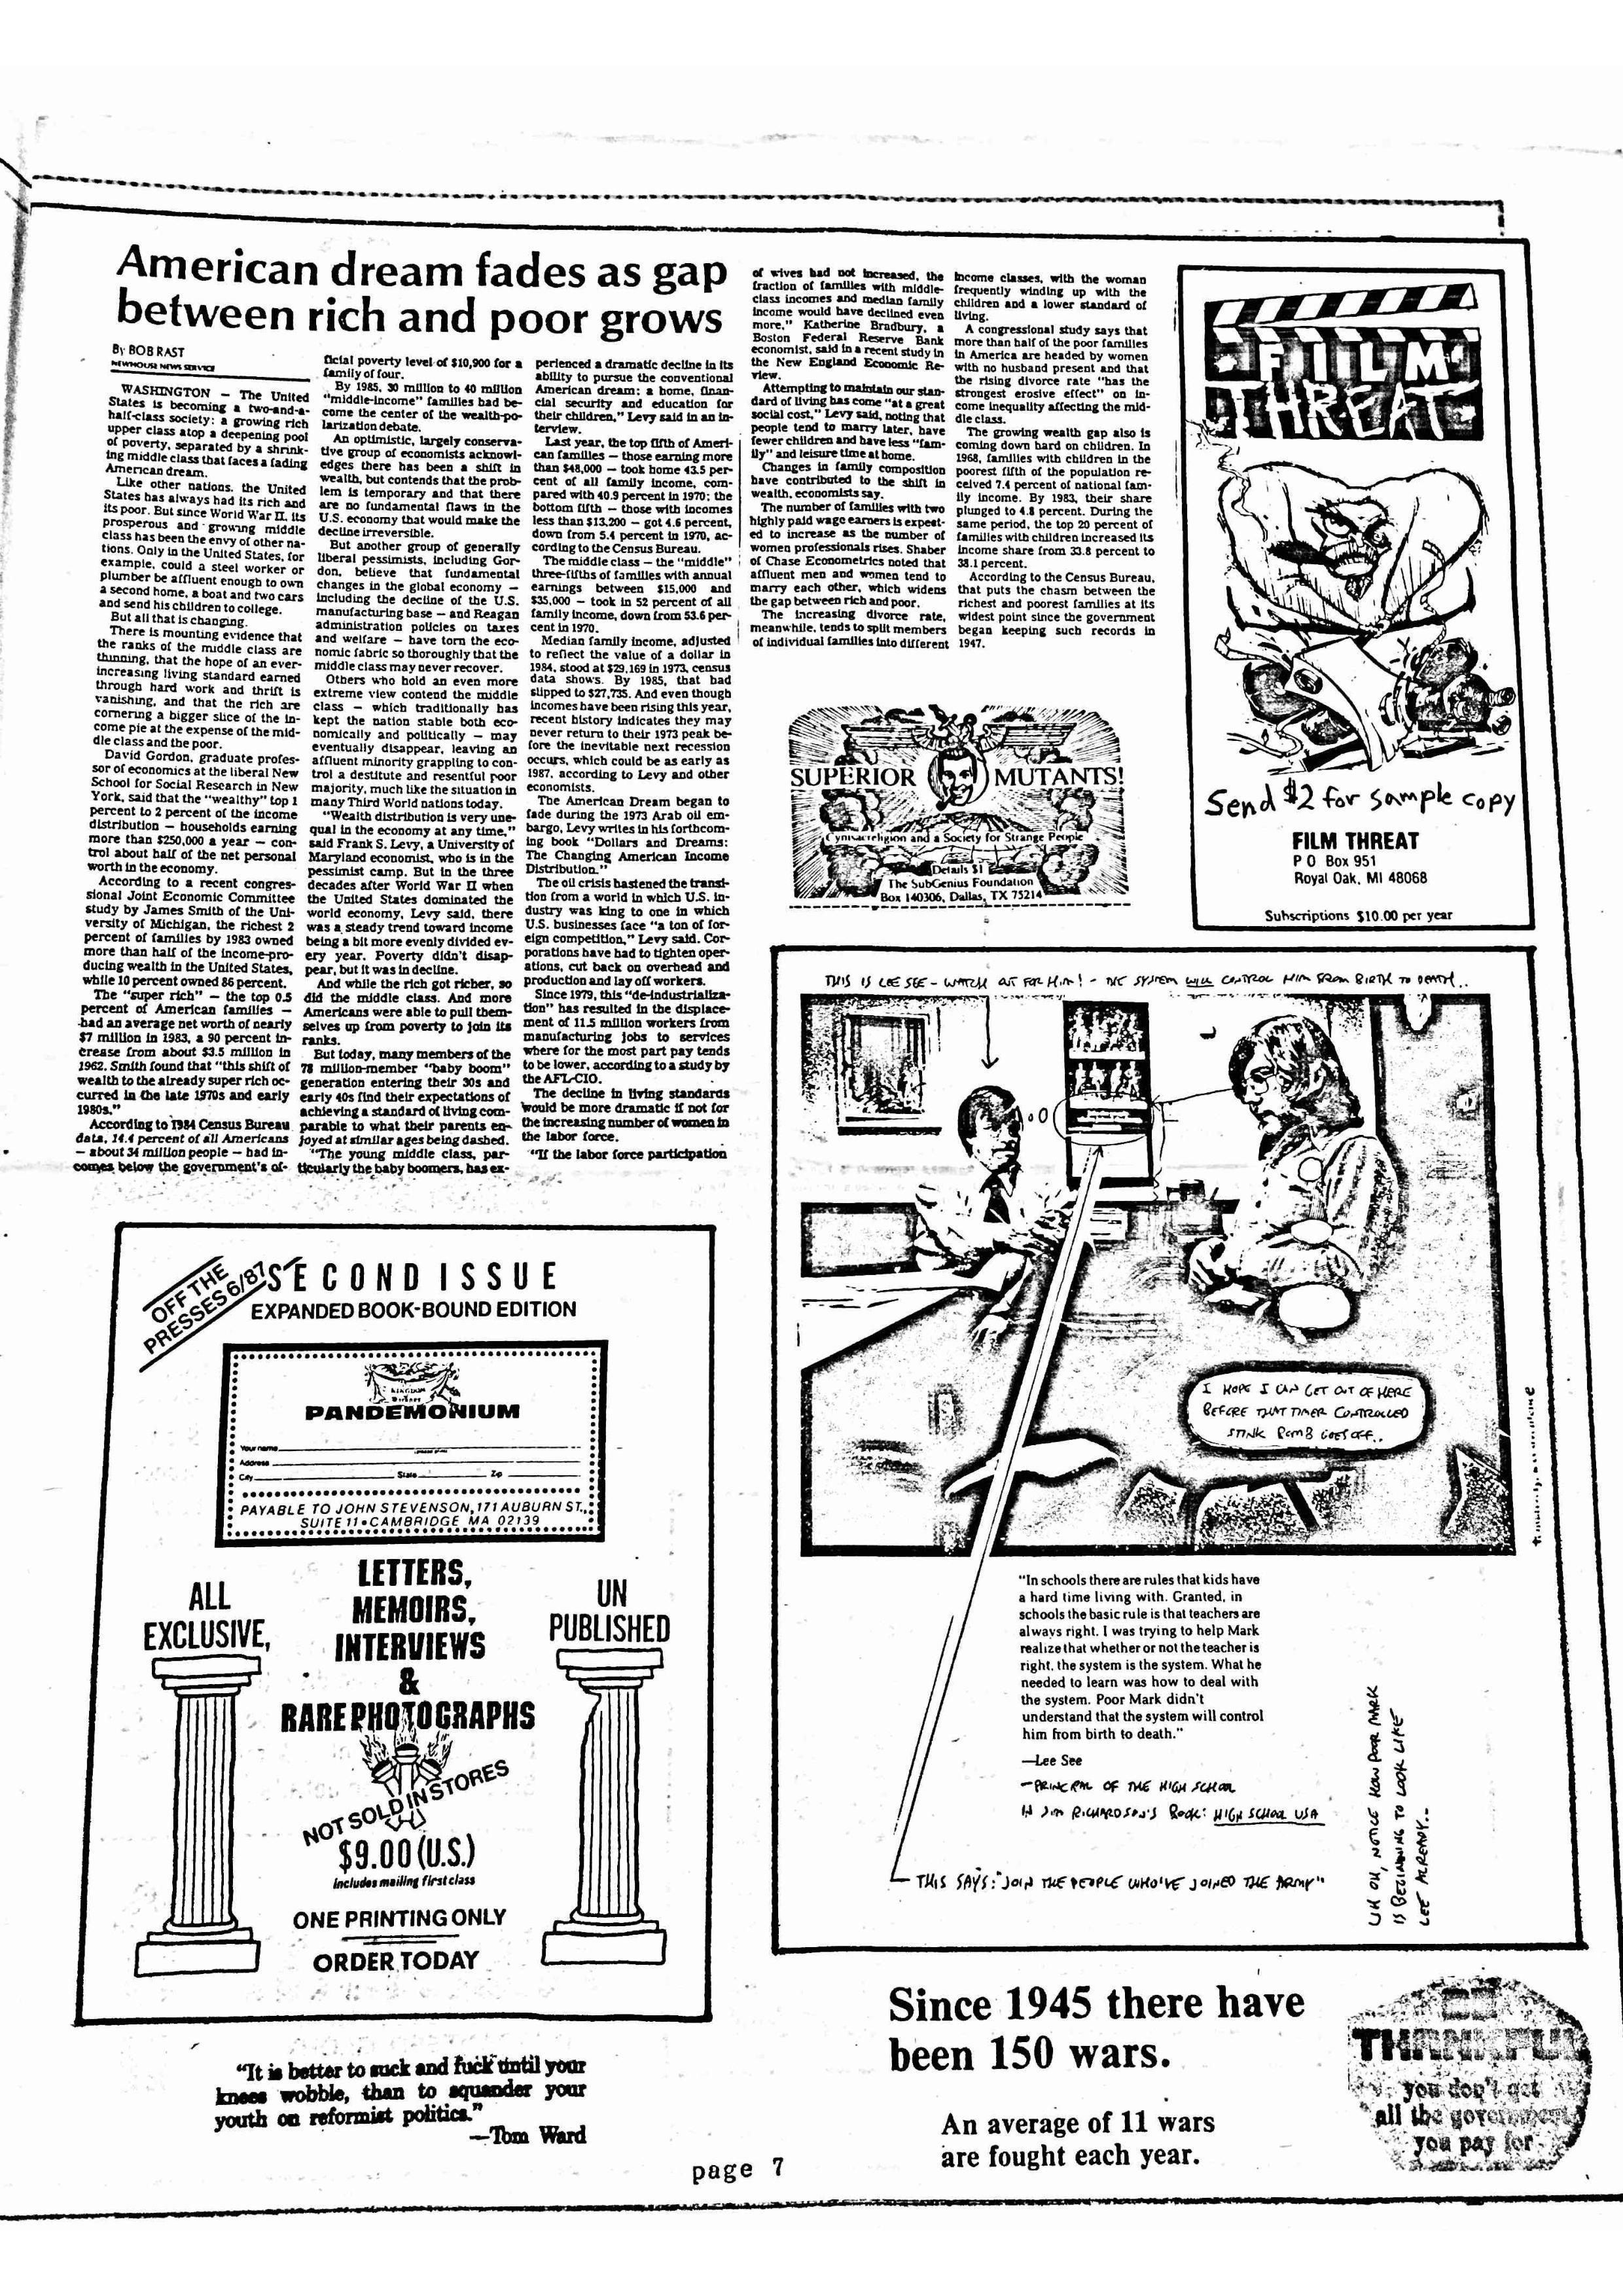 PopRealLast1-page-012.jpg